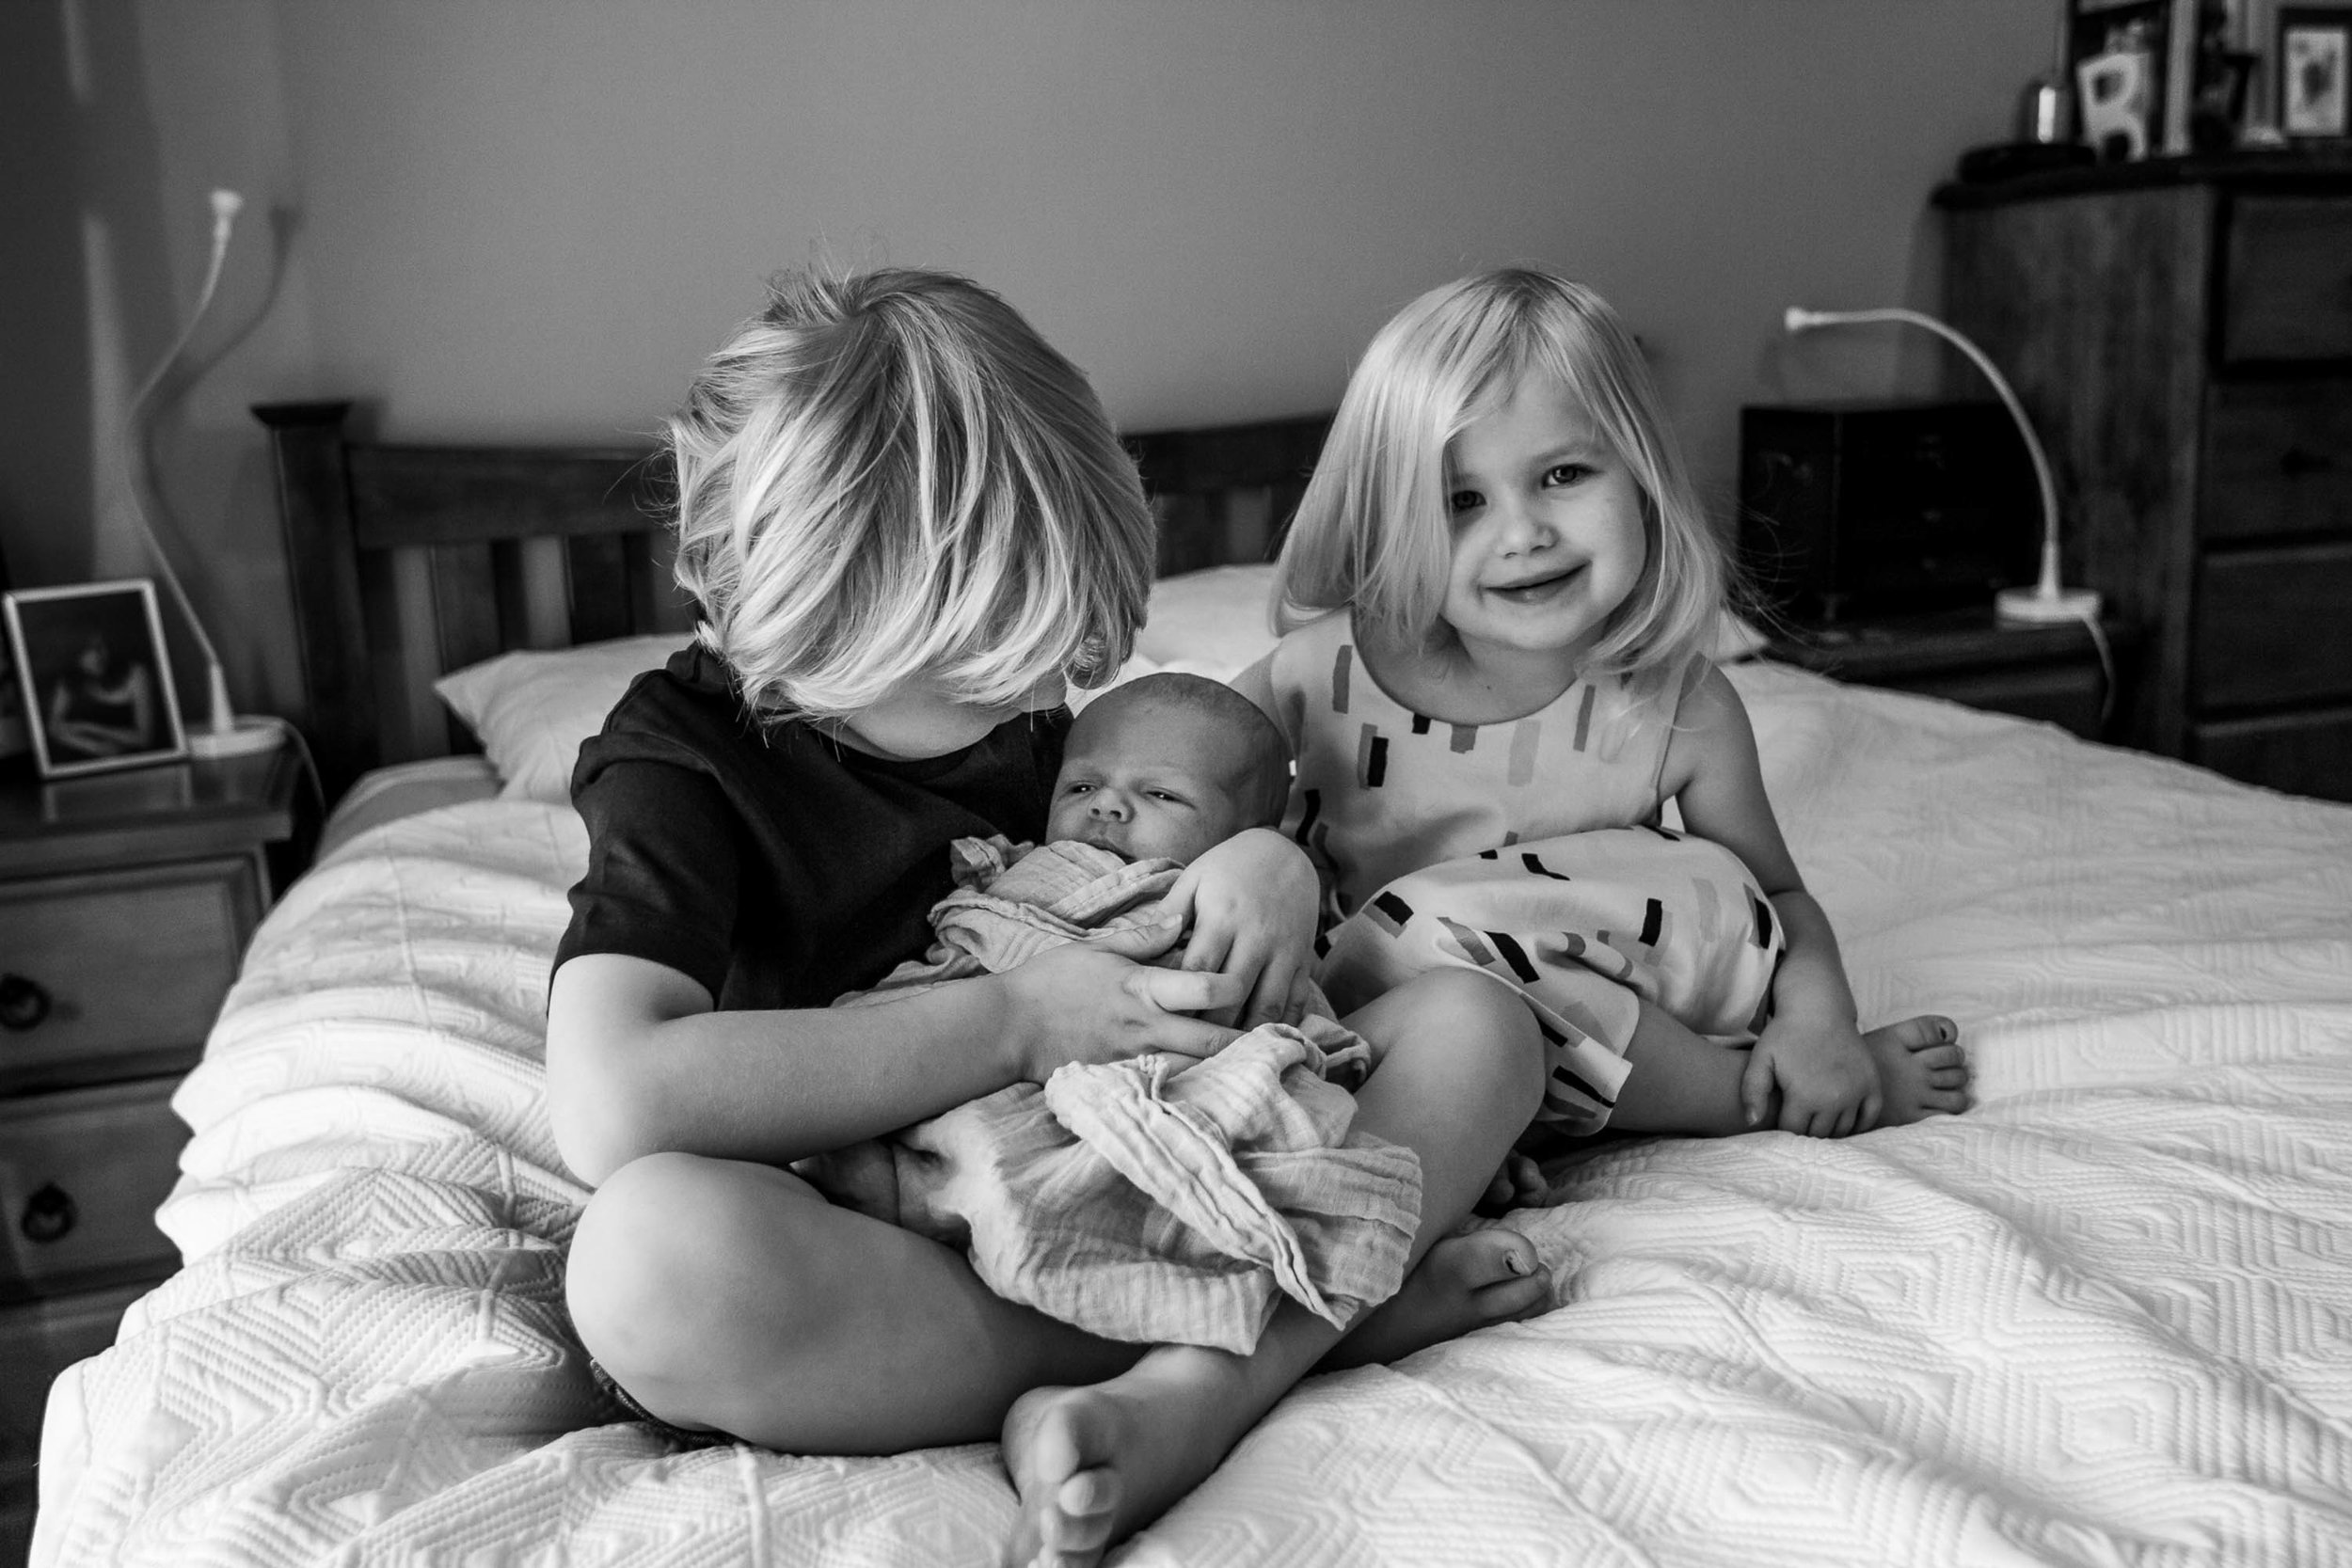 JackandPurdy-Family-Photography-Lifestyle-Newborn-24.jpg